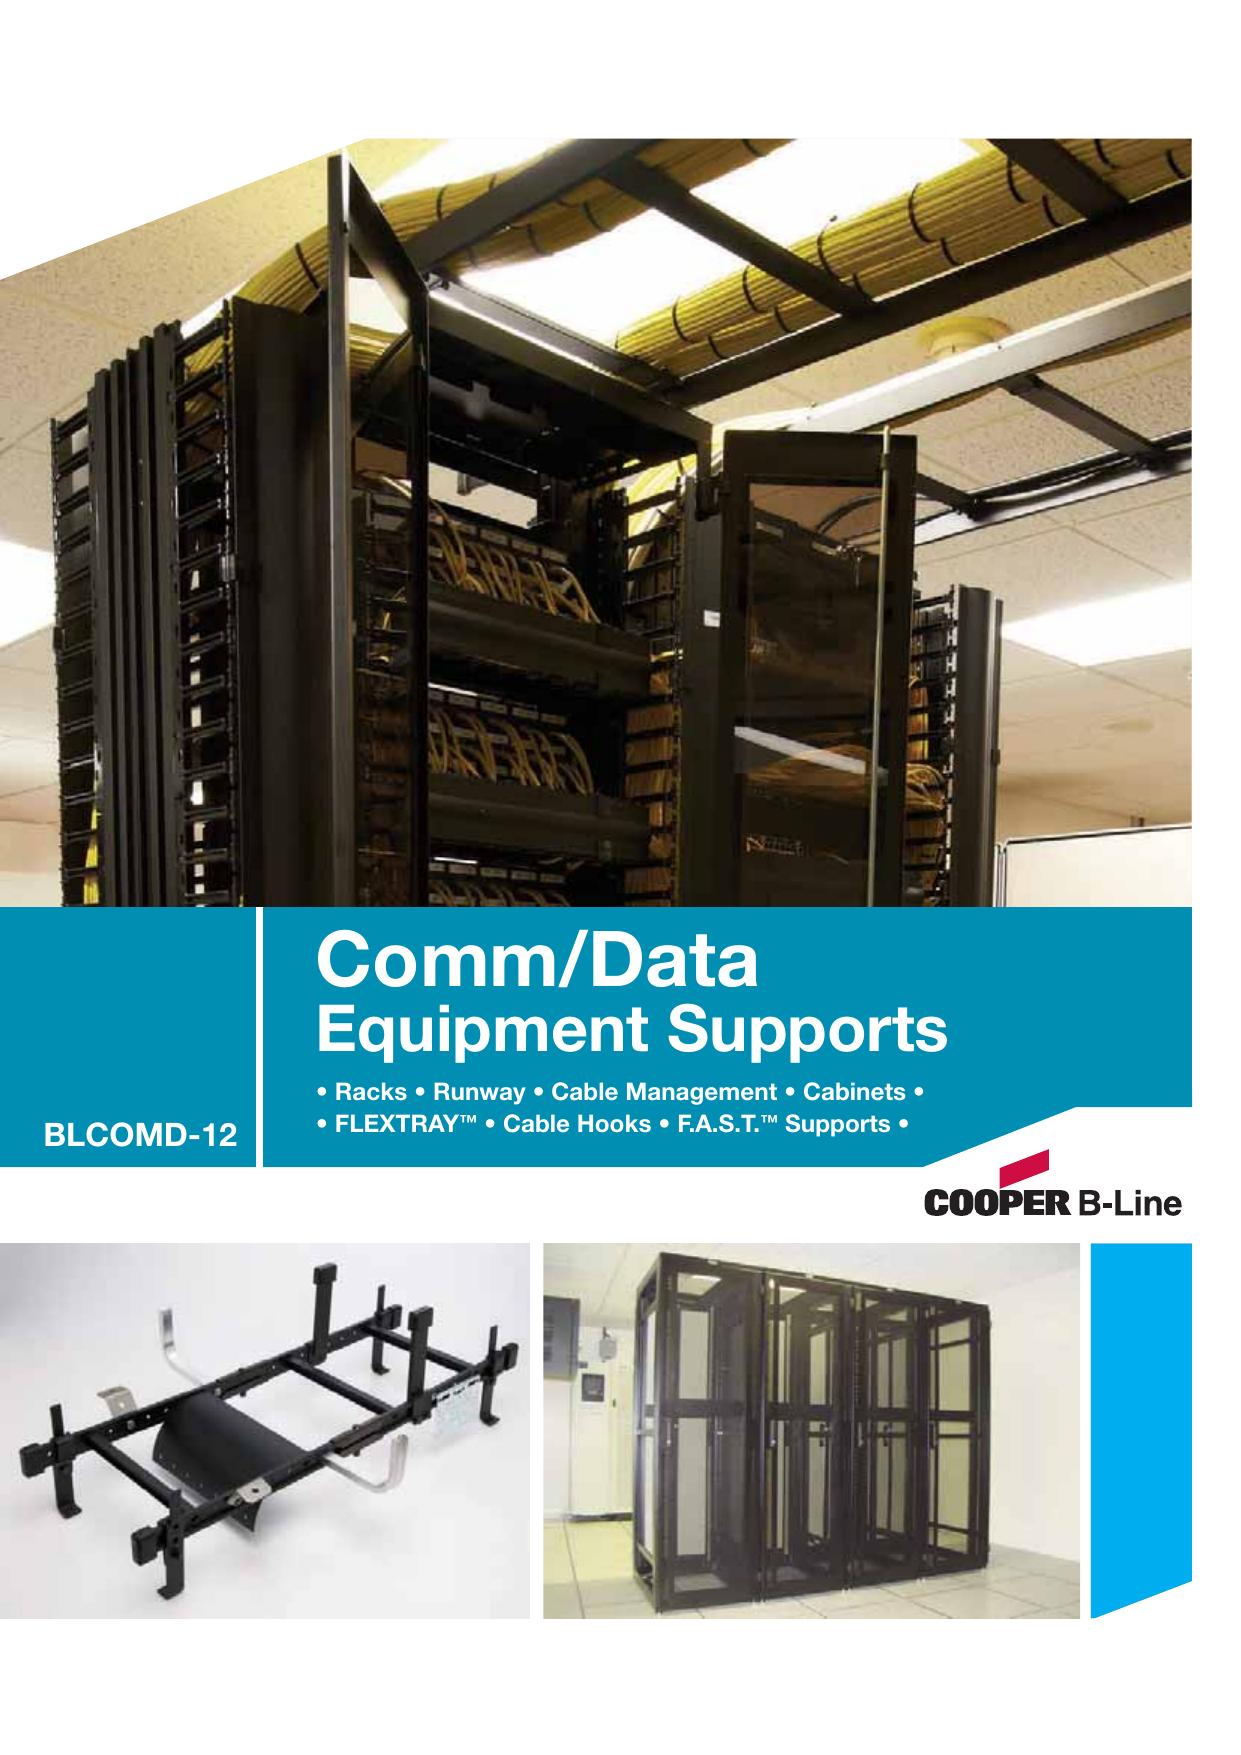 Cooper B-Line - Comm/Data Equipment Supports Catalog | manualzz.com